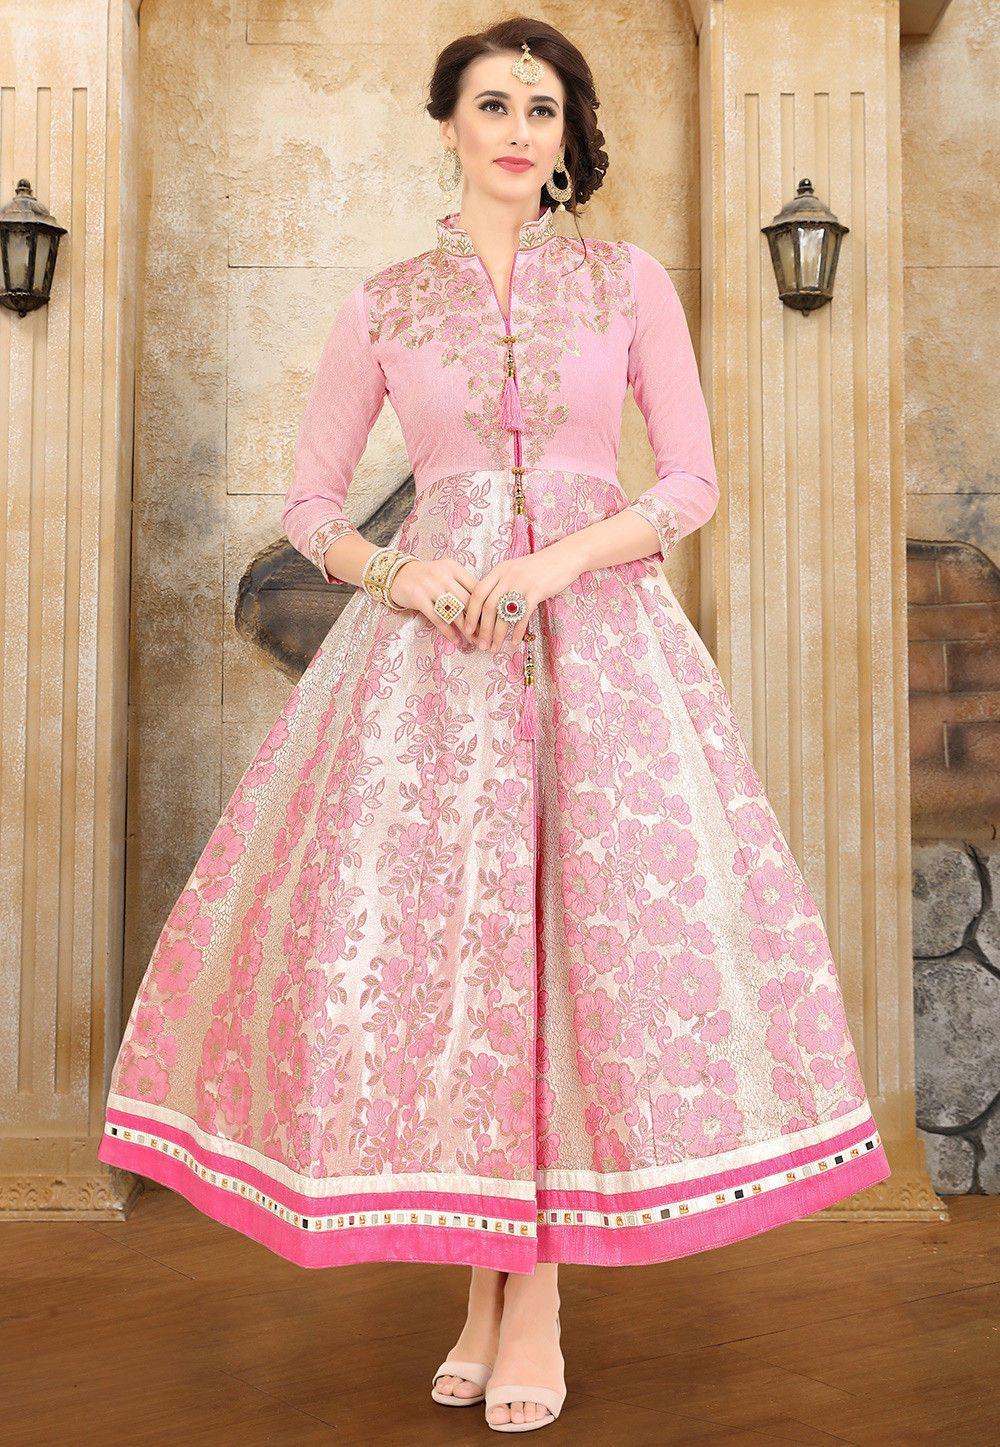 Buy Embroidered Brocade Anarkali Kurta in Baby Pink online, Item code:  TAV3, Color: Pink, Occasion: Festive,… | Kurti designs, Long kurti designs,  Party wear kurtis